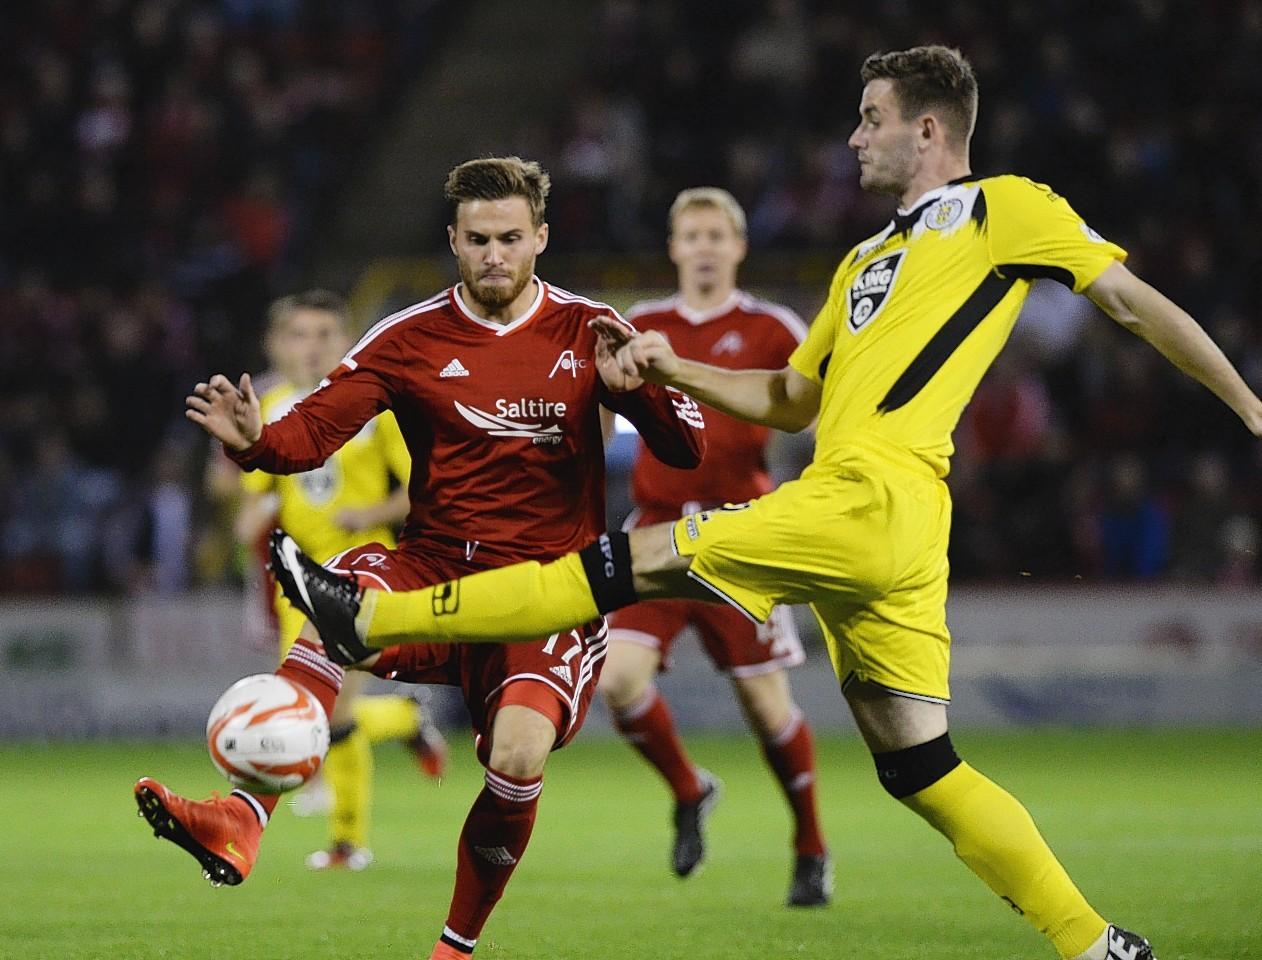 David Goodwillie in action against St Mirren earlier this season